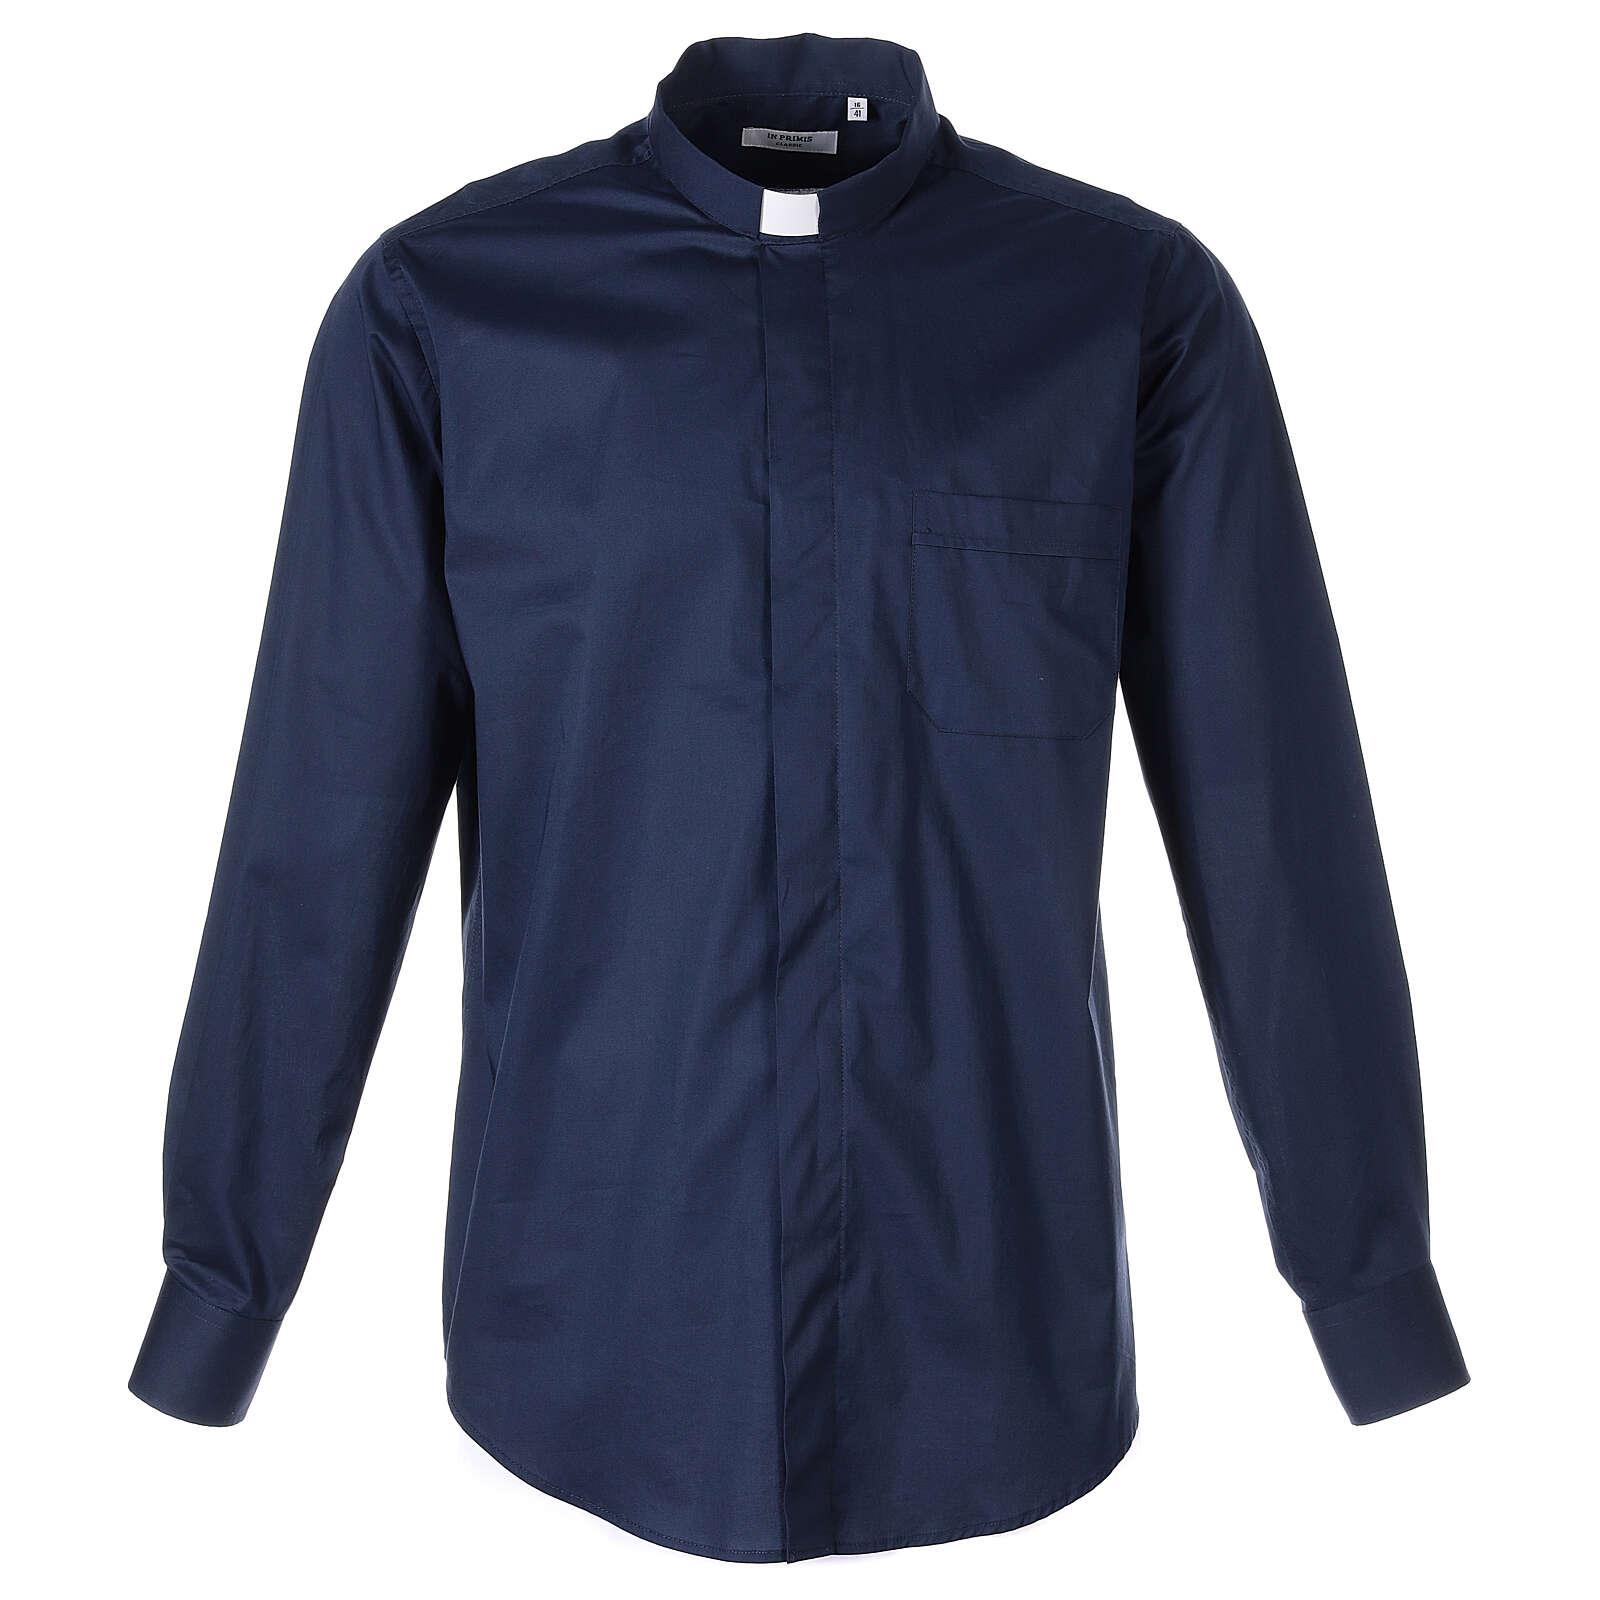 Camicia clergy In Primis elasticizzata cotone manica lunga blu 4